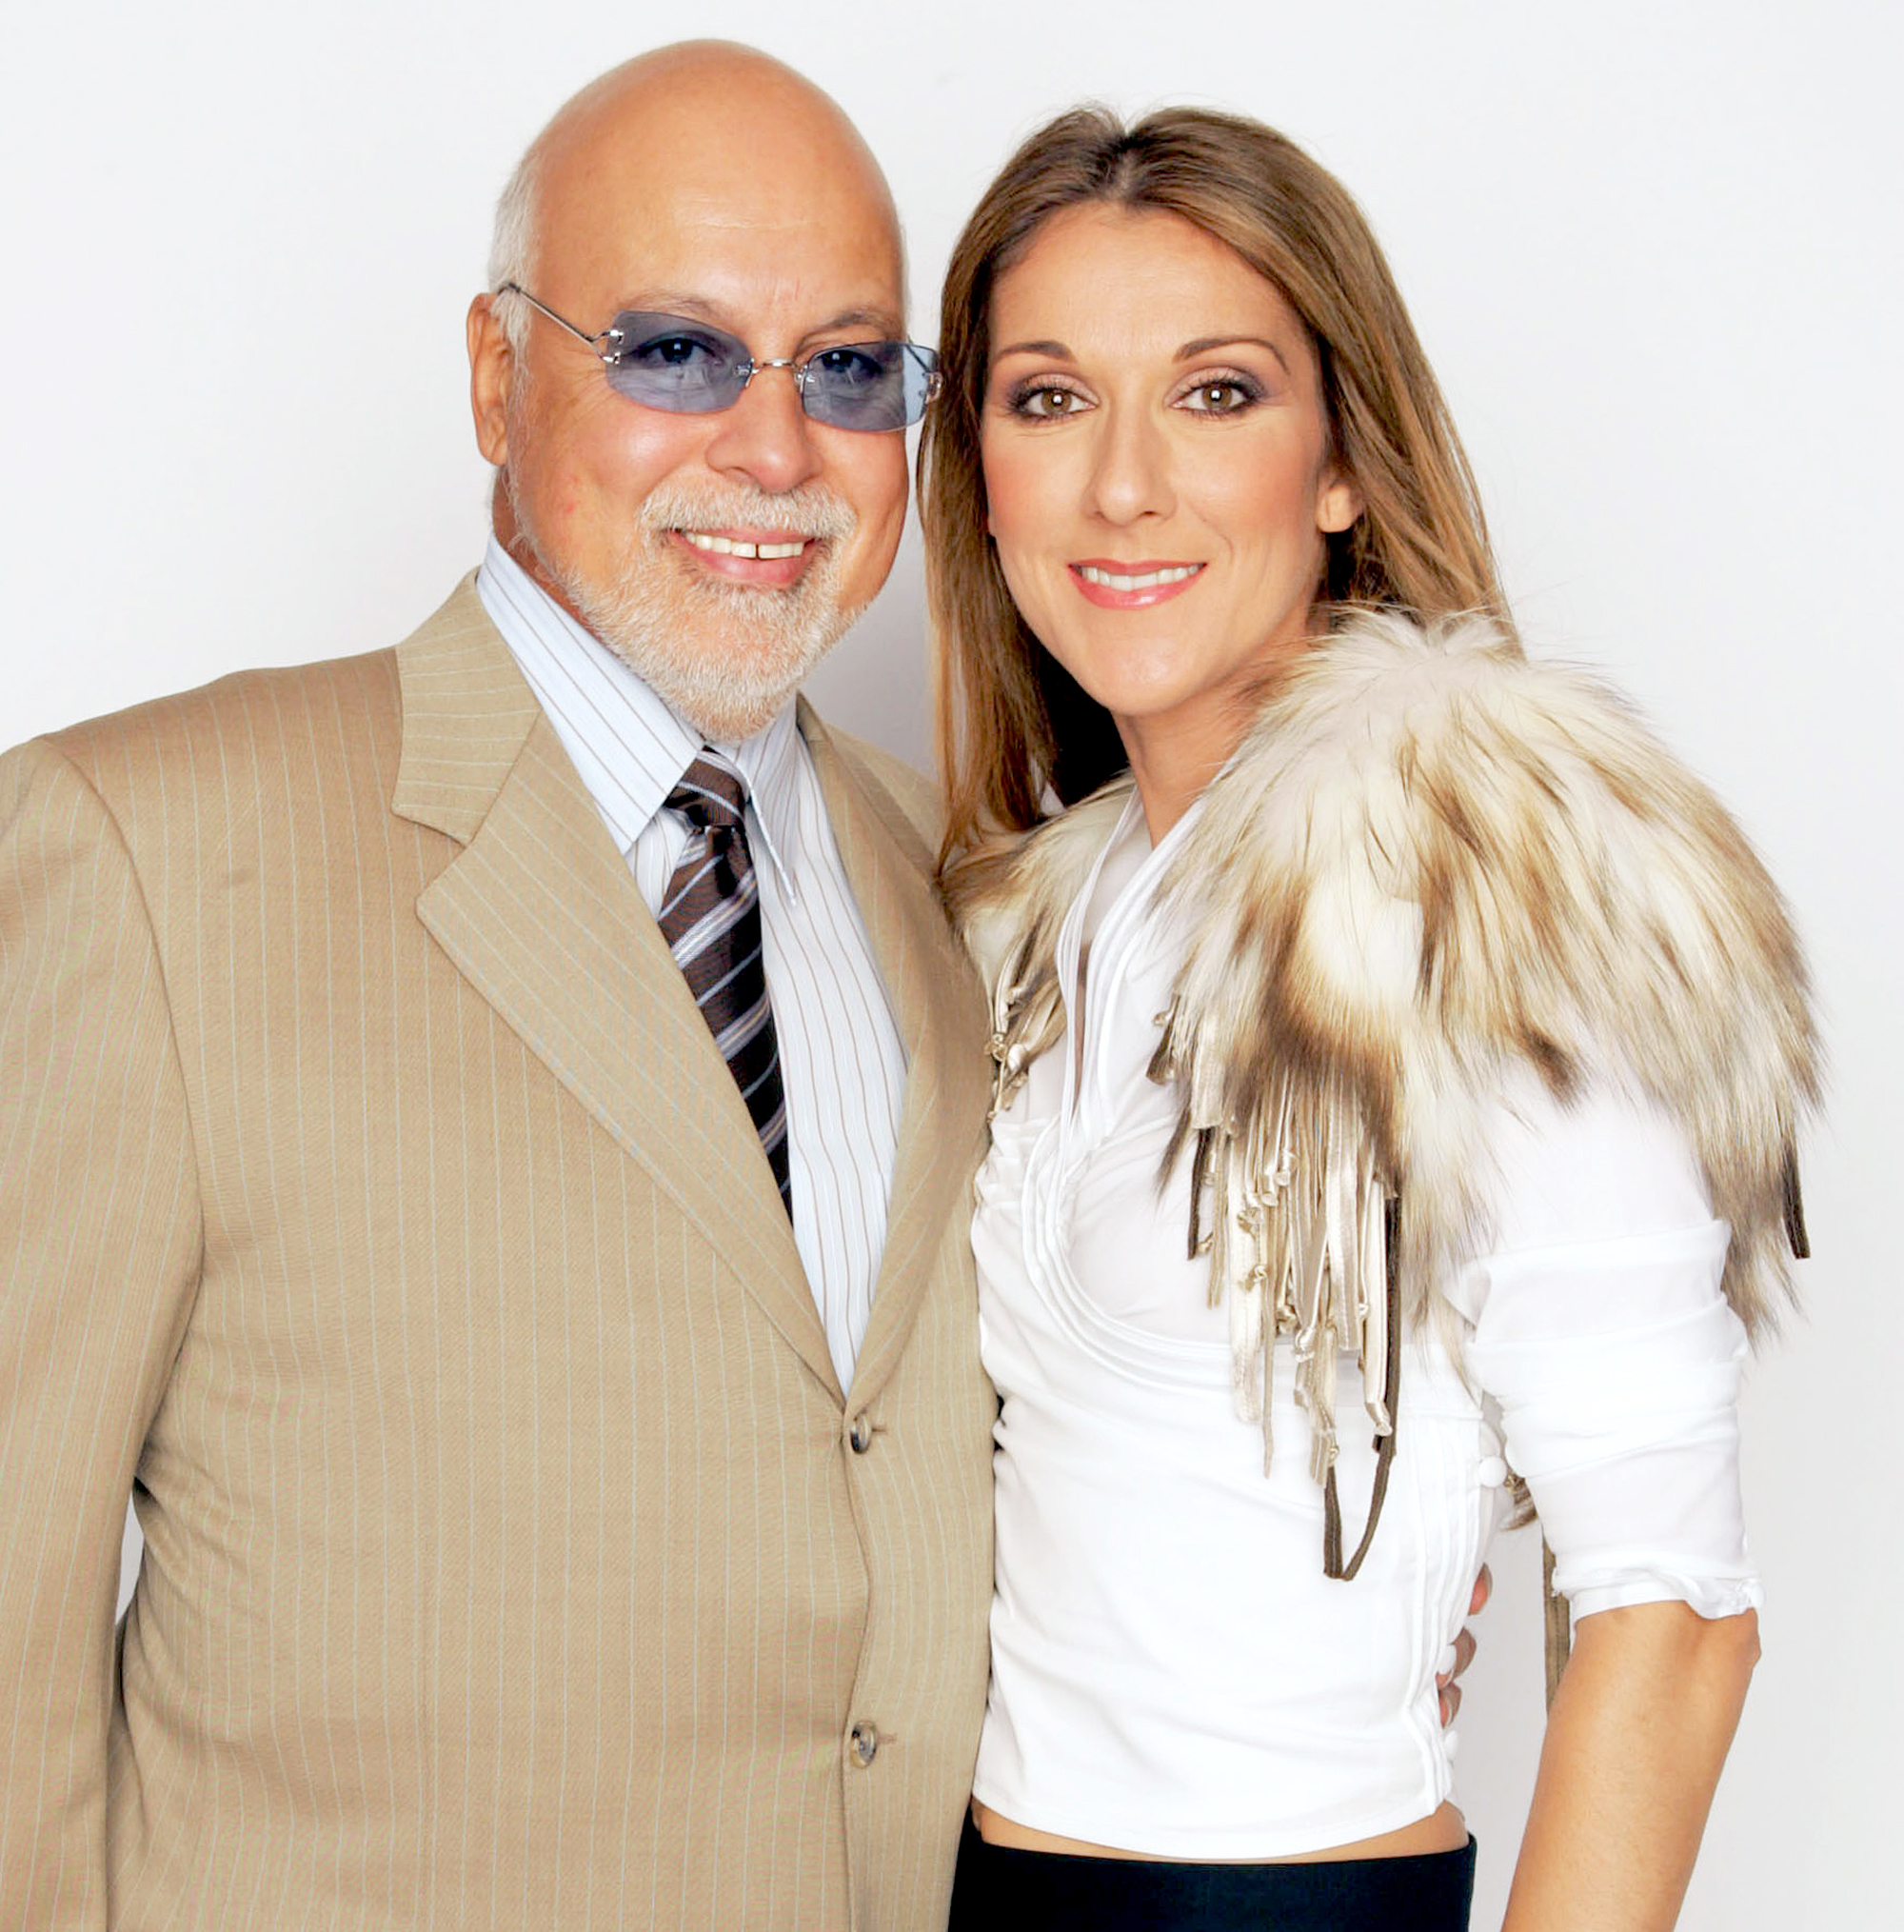 Doctors helped Celine Dion to get pregnant 20.08.2009 5